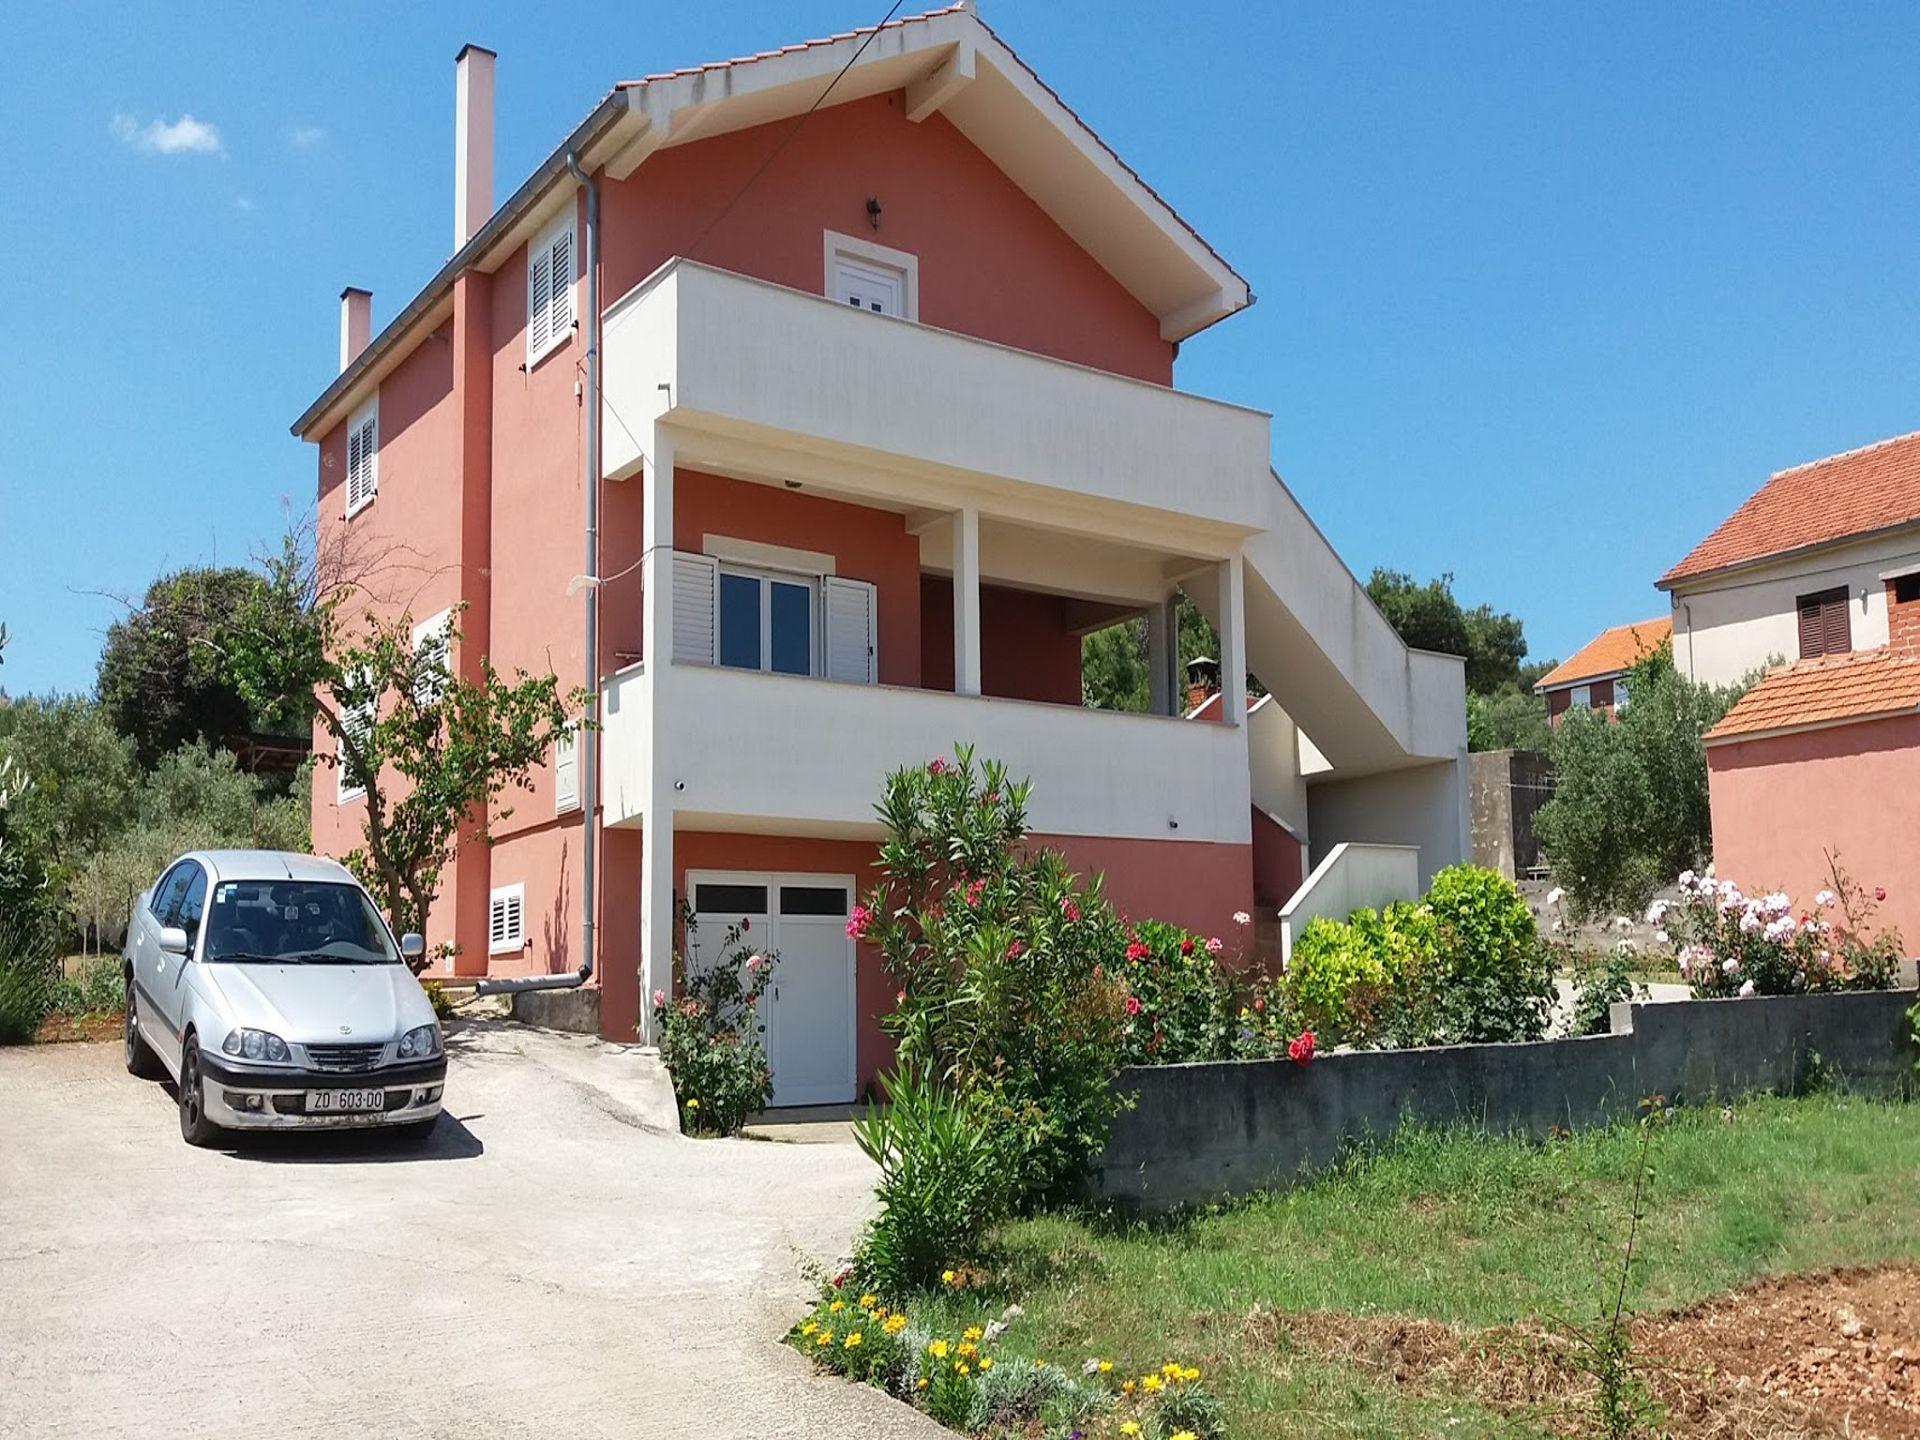 Mare - Dobropoljana - Appartementen Kroatië